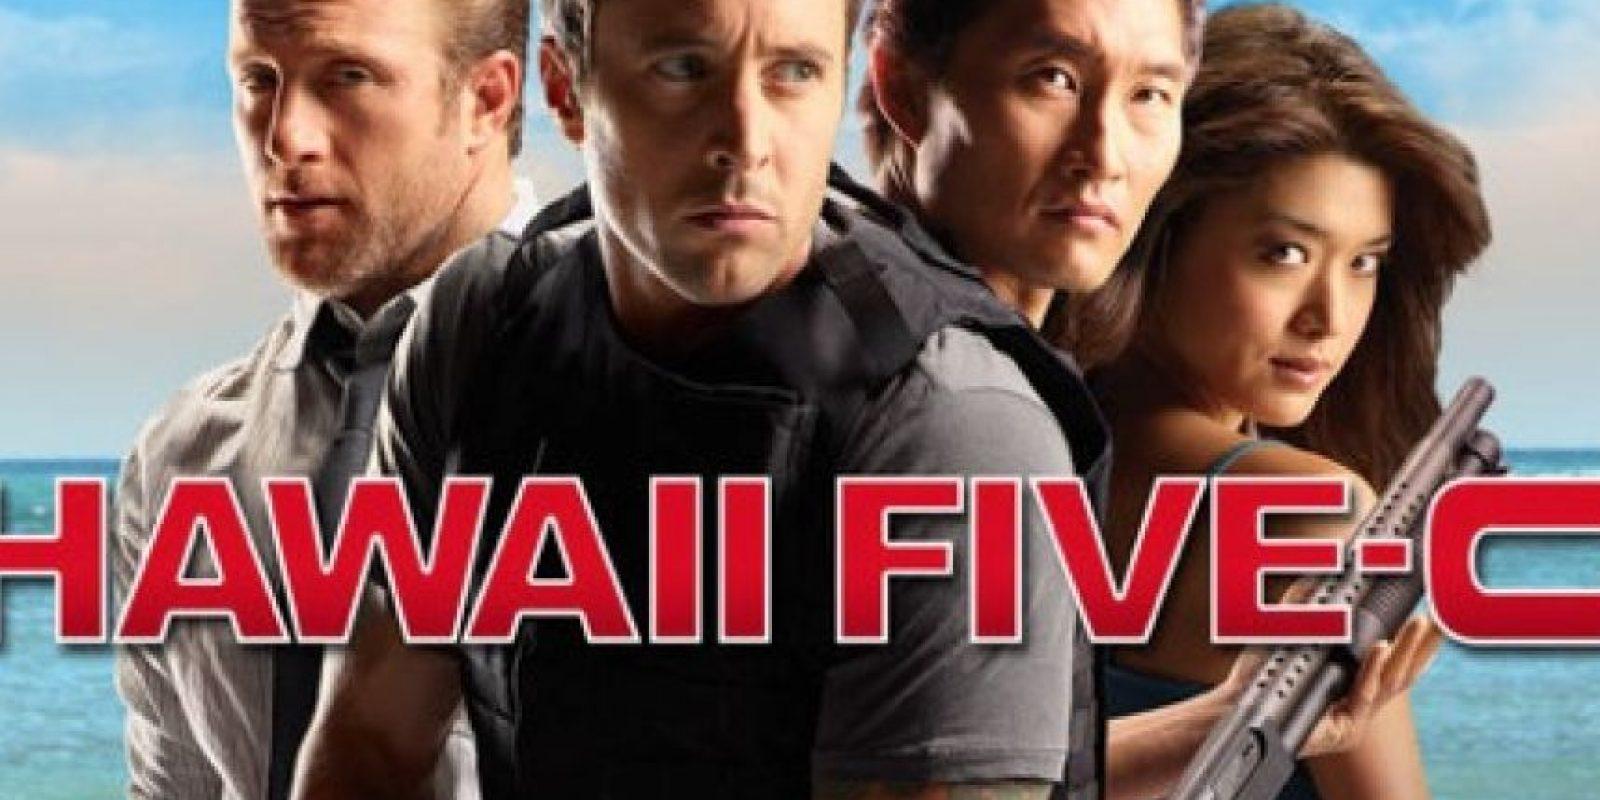 """Hawaii Five-O"" temporada 5 – Disponible a partir del 15 de marzo."